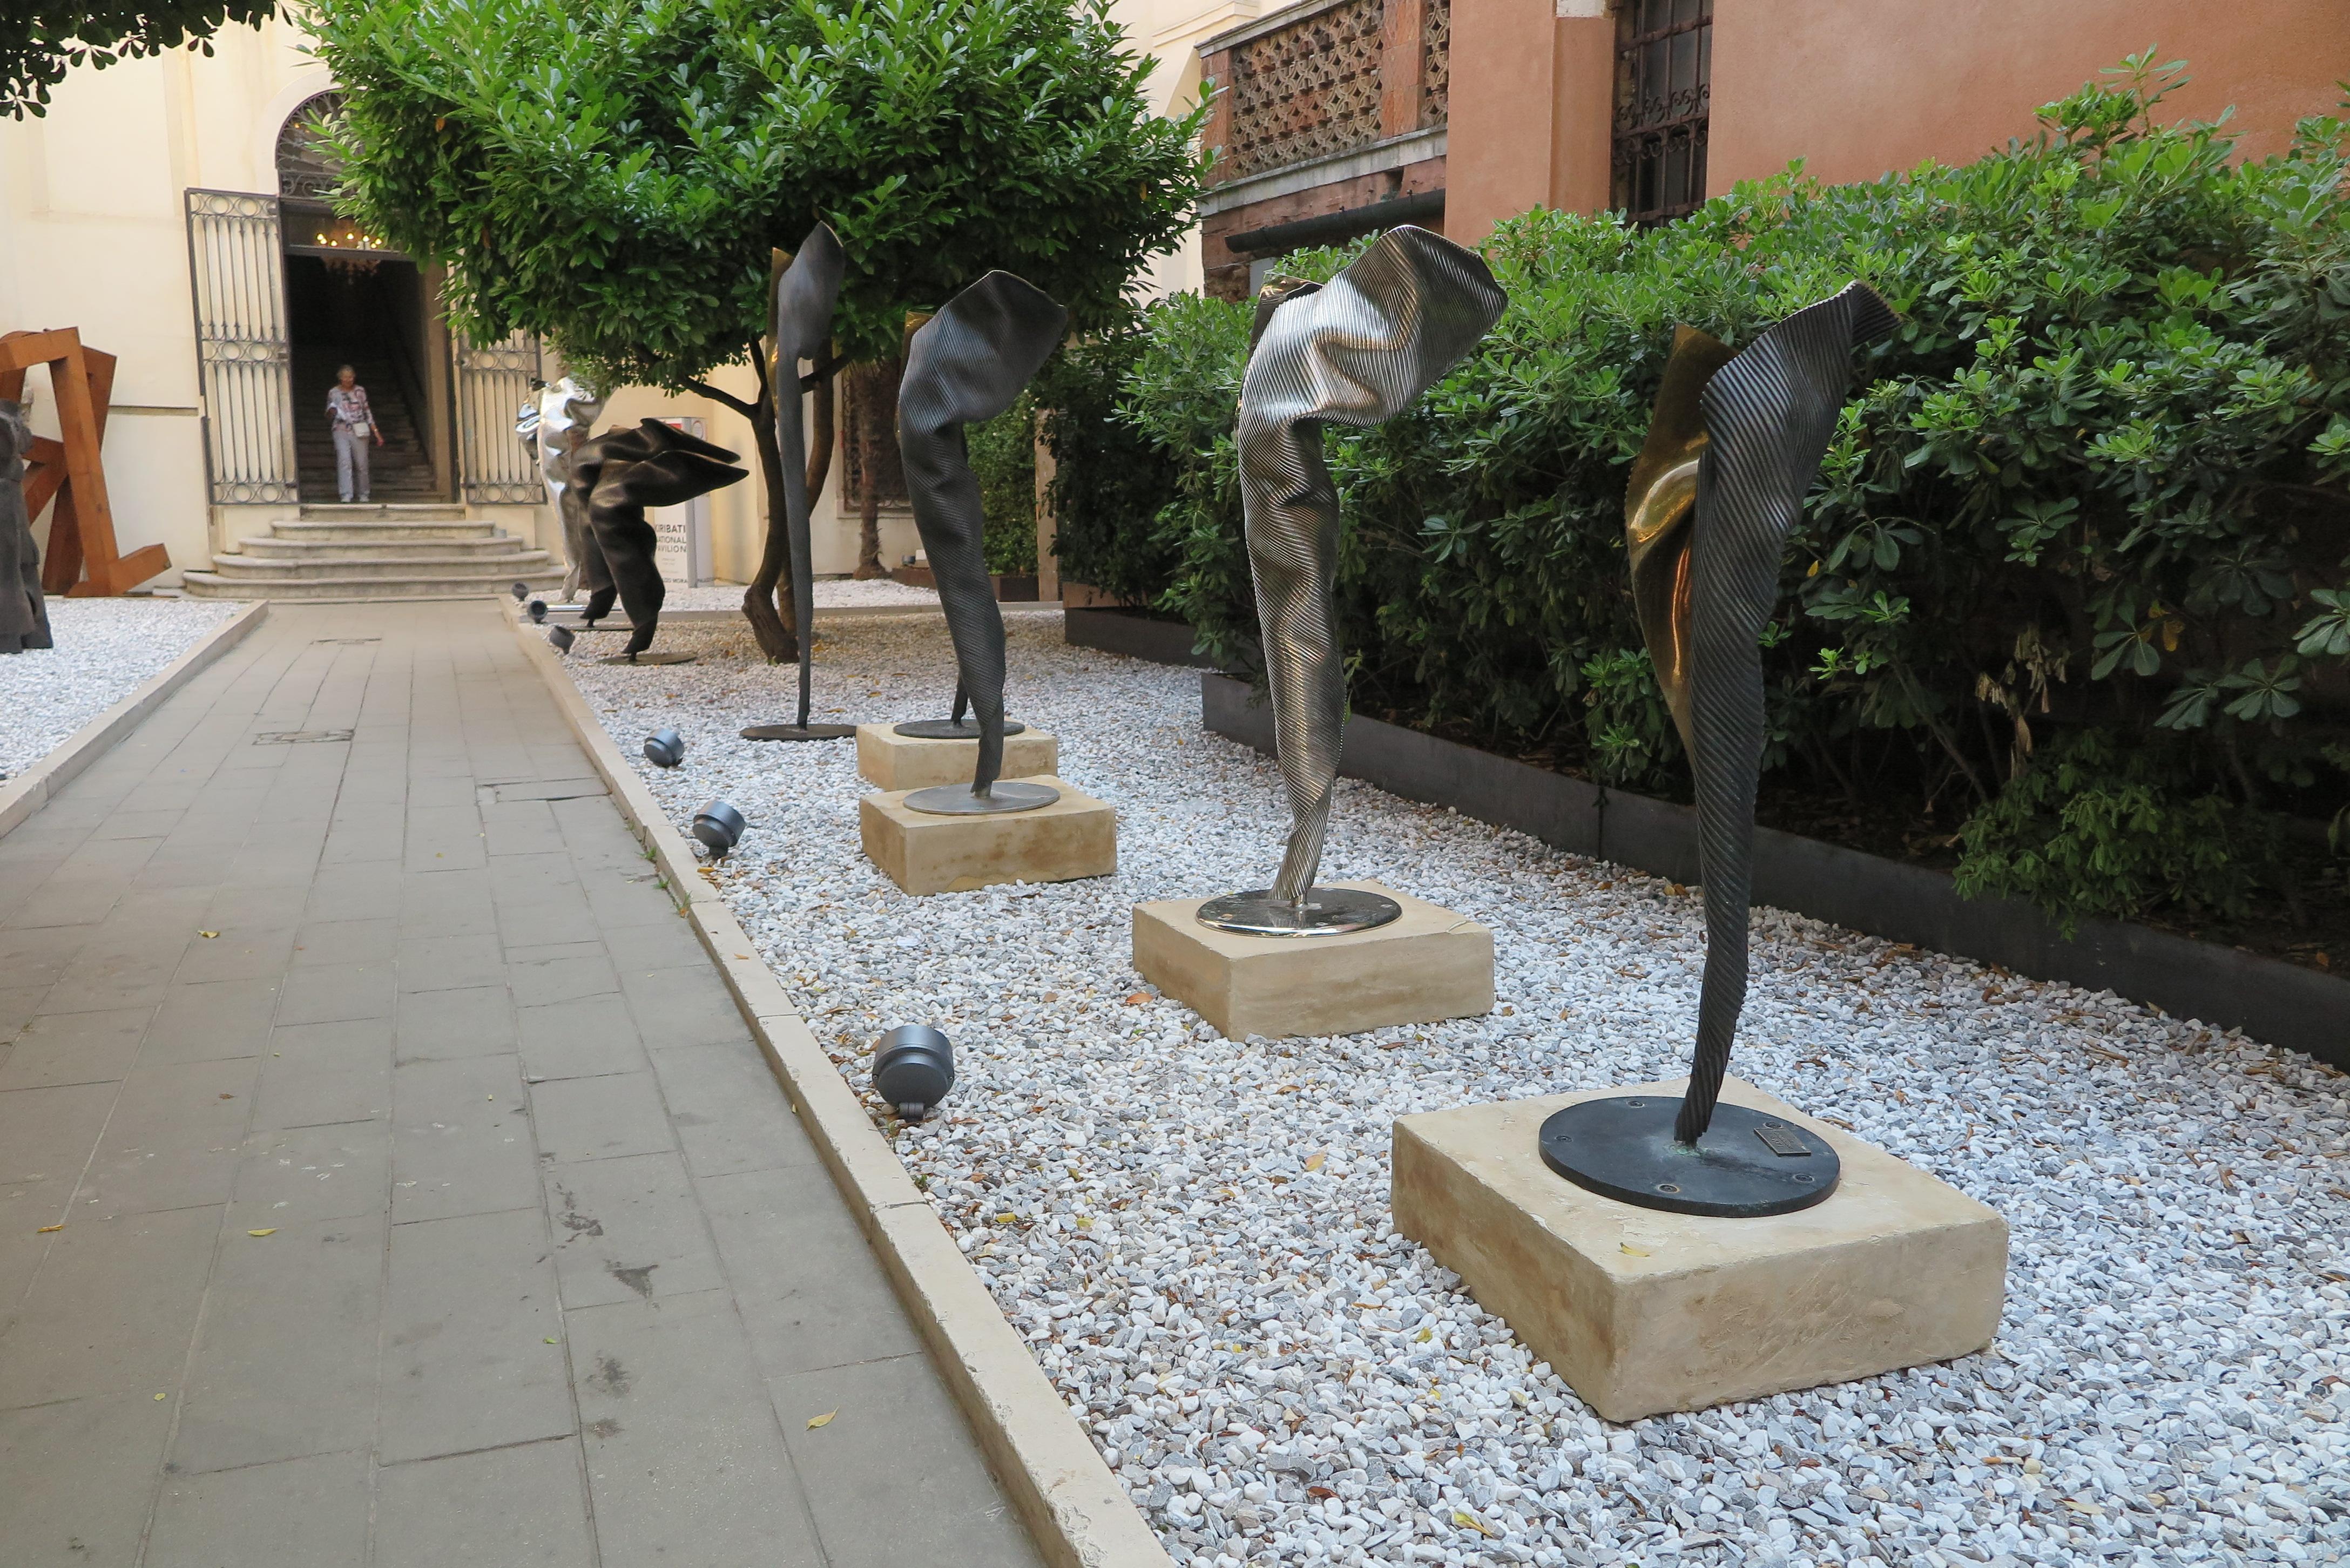 Palazzo Mora - Andrew Rogers (European Cultural Centre)